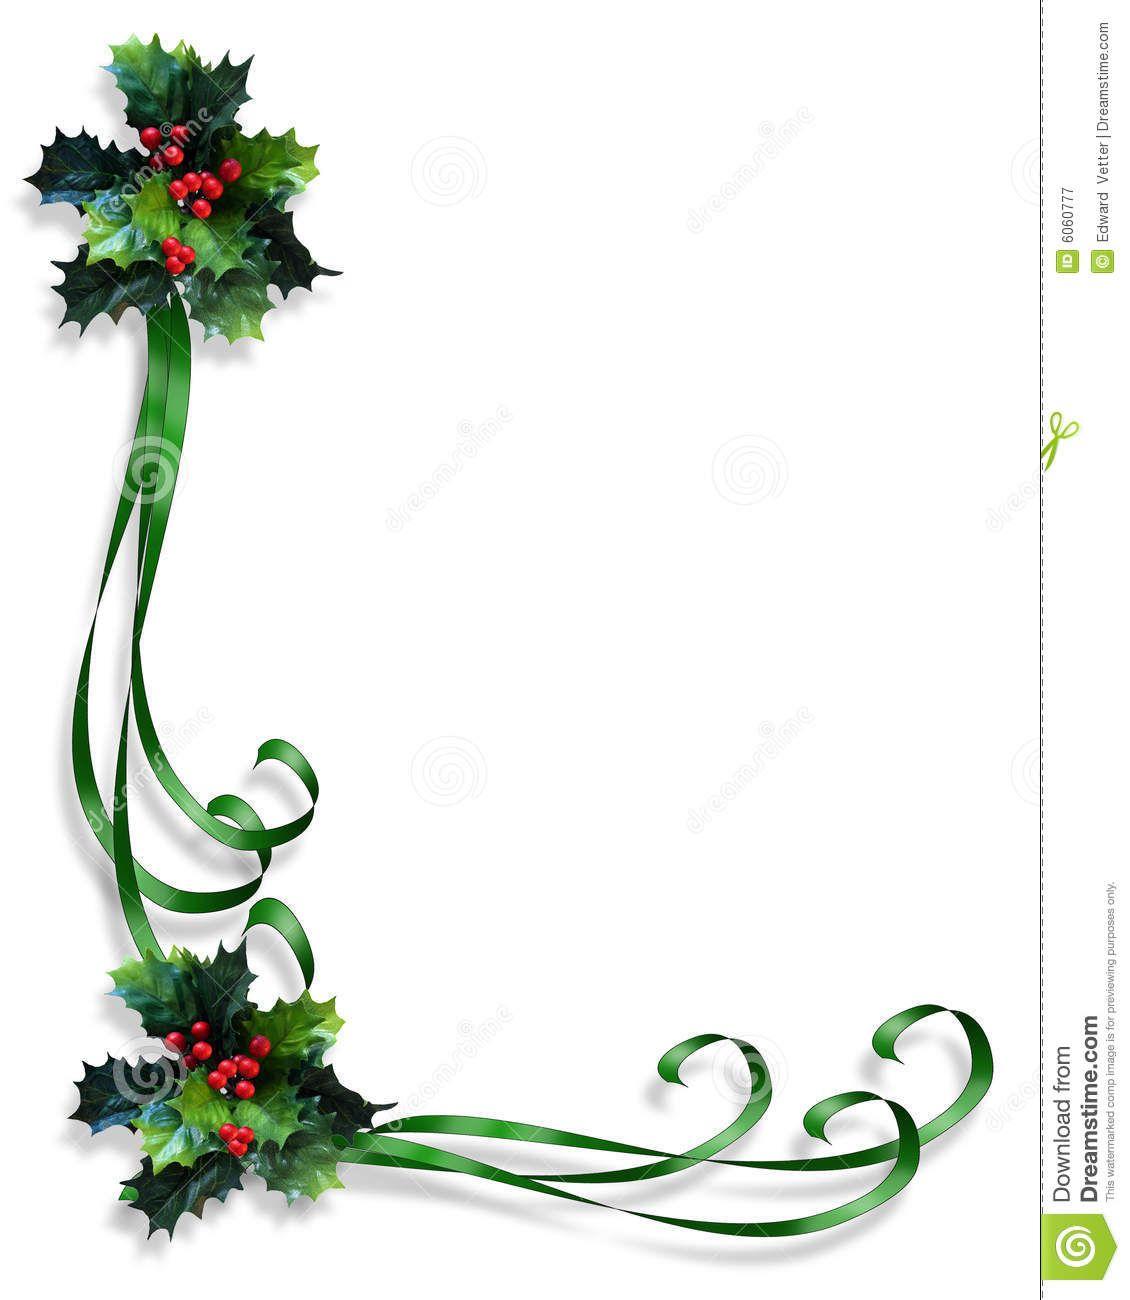 Free Ribbon Border Clip Art Christmas Border Holly And Ribbons Royalty Free Christmas Borders Christmas Border Free Christmas Printables